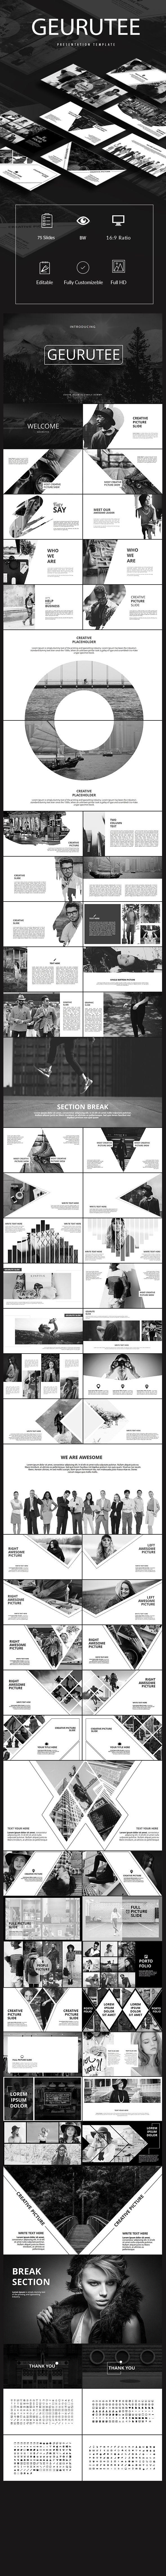 Gerutee Presentation Template (PowerPoint Templates)